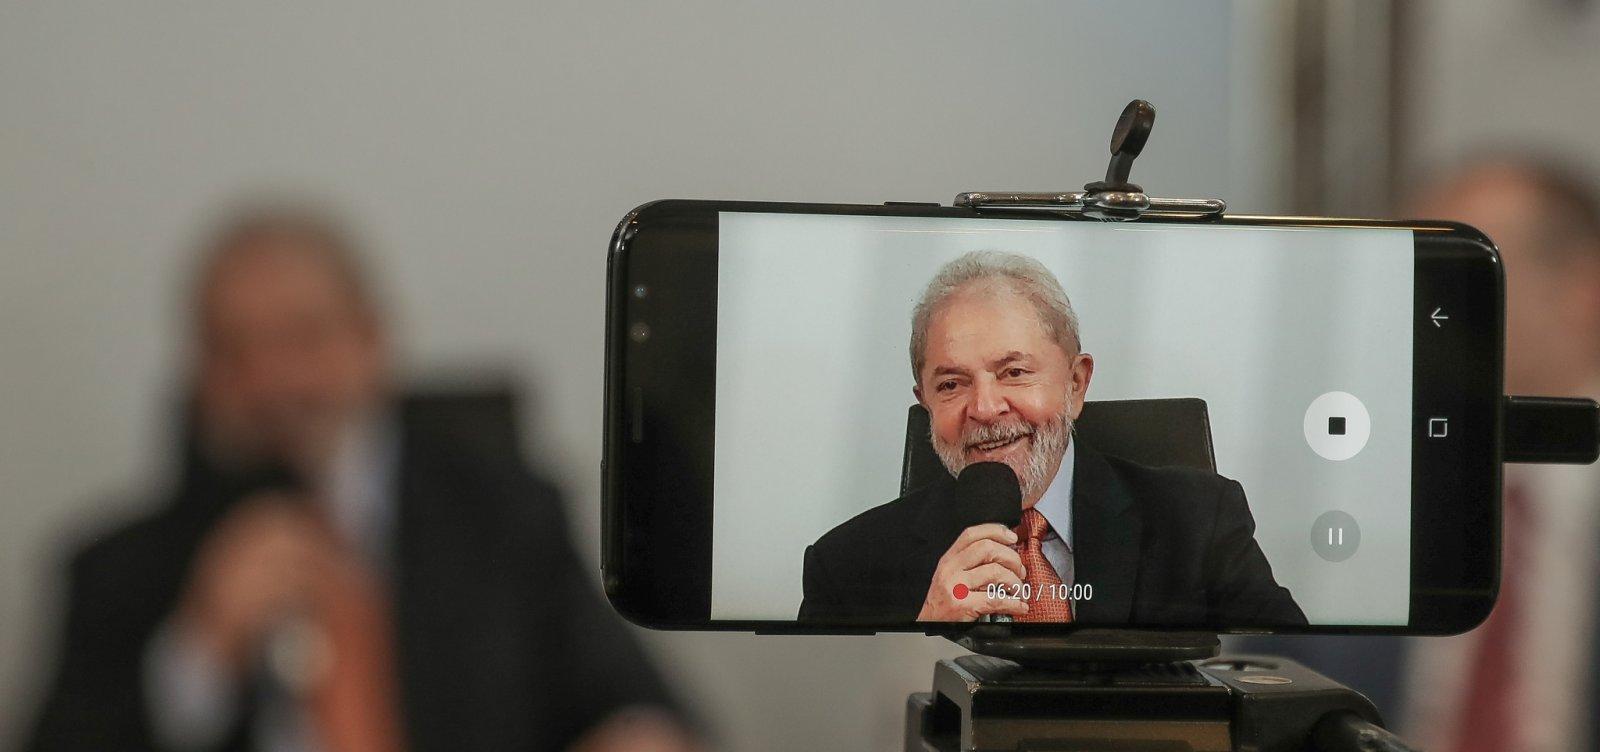 Ministro do Supremoautoriza Lula a conceder entrevista